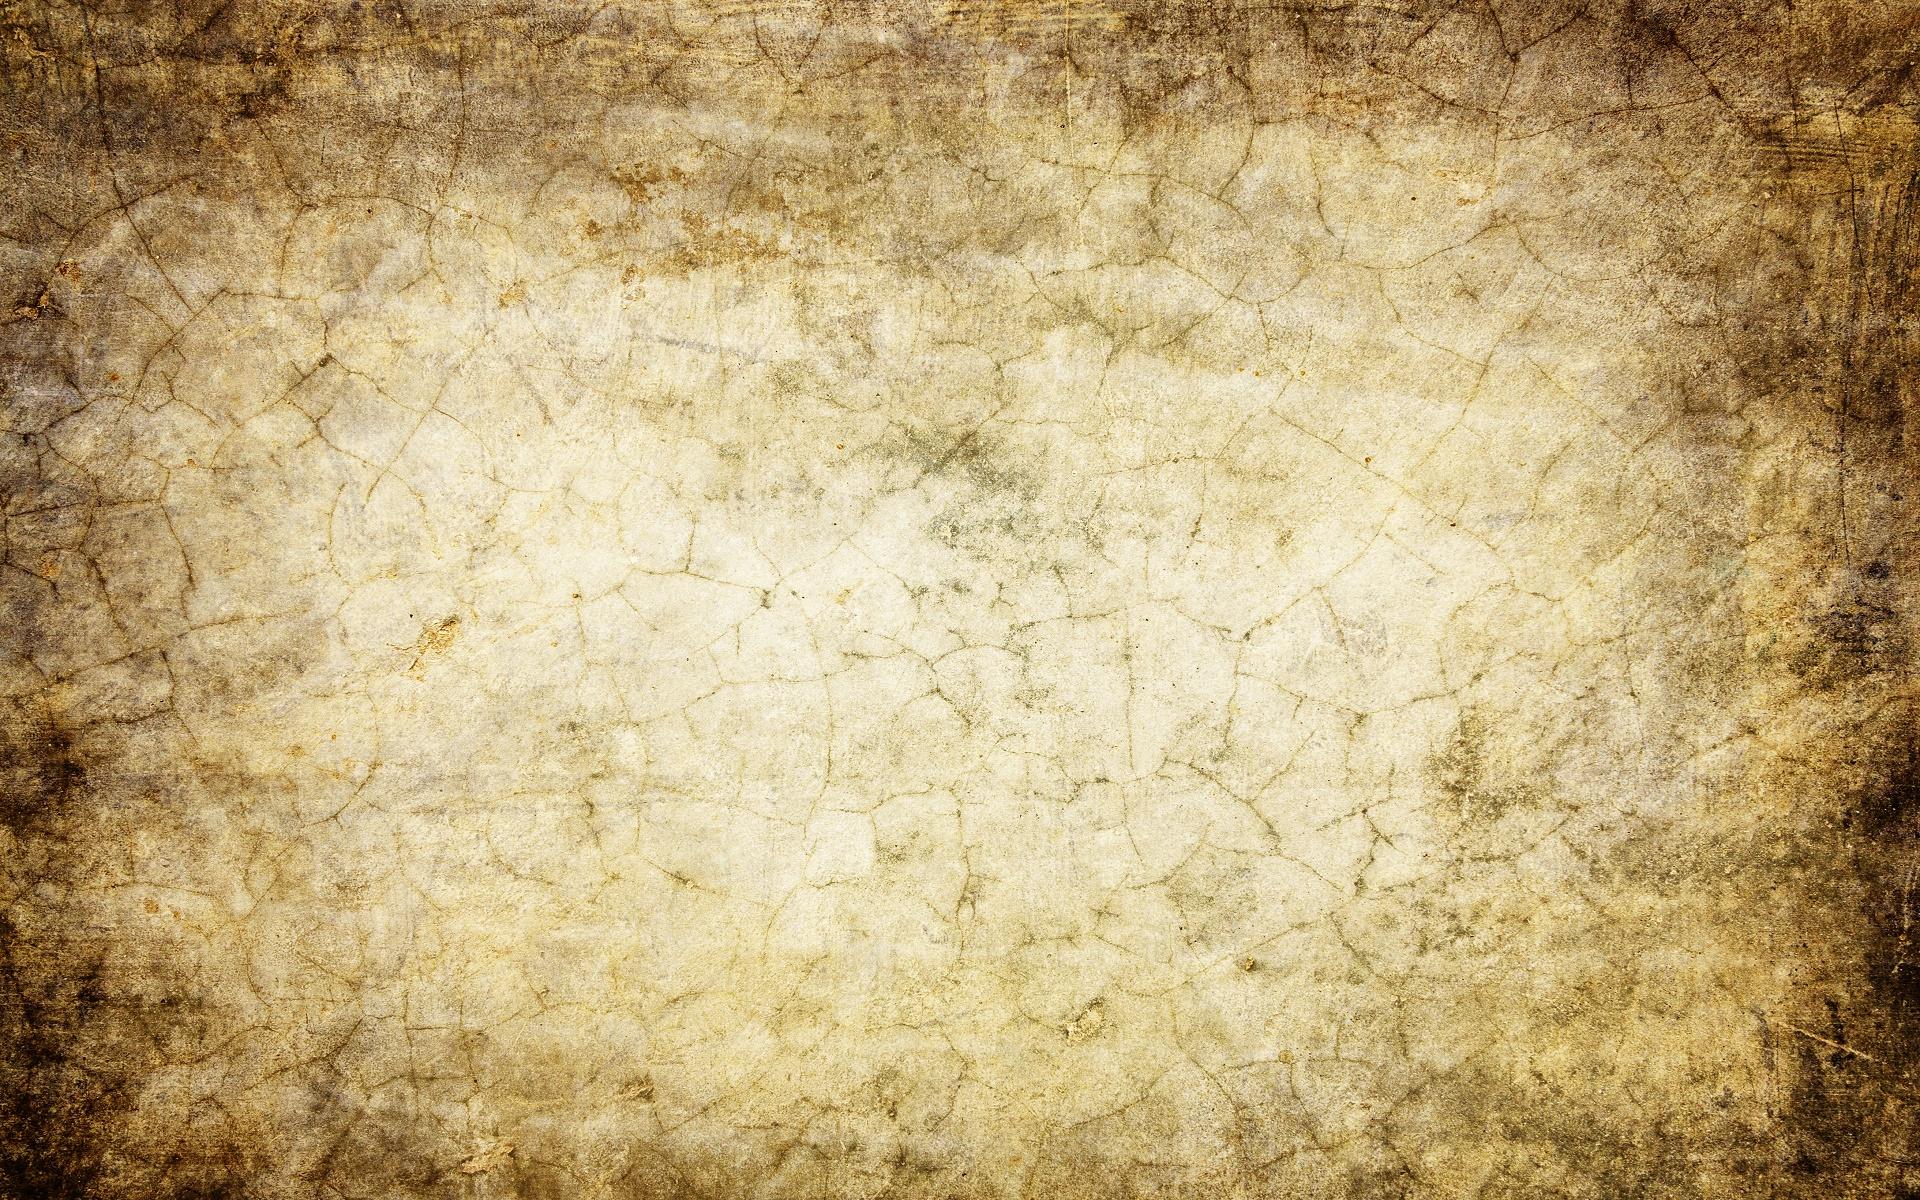 Vintage Cars Hd Wallpapers Free Download Yellow Grunge Wallpaper Hd Pixelstalk Net